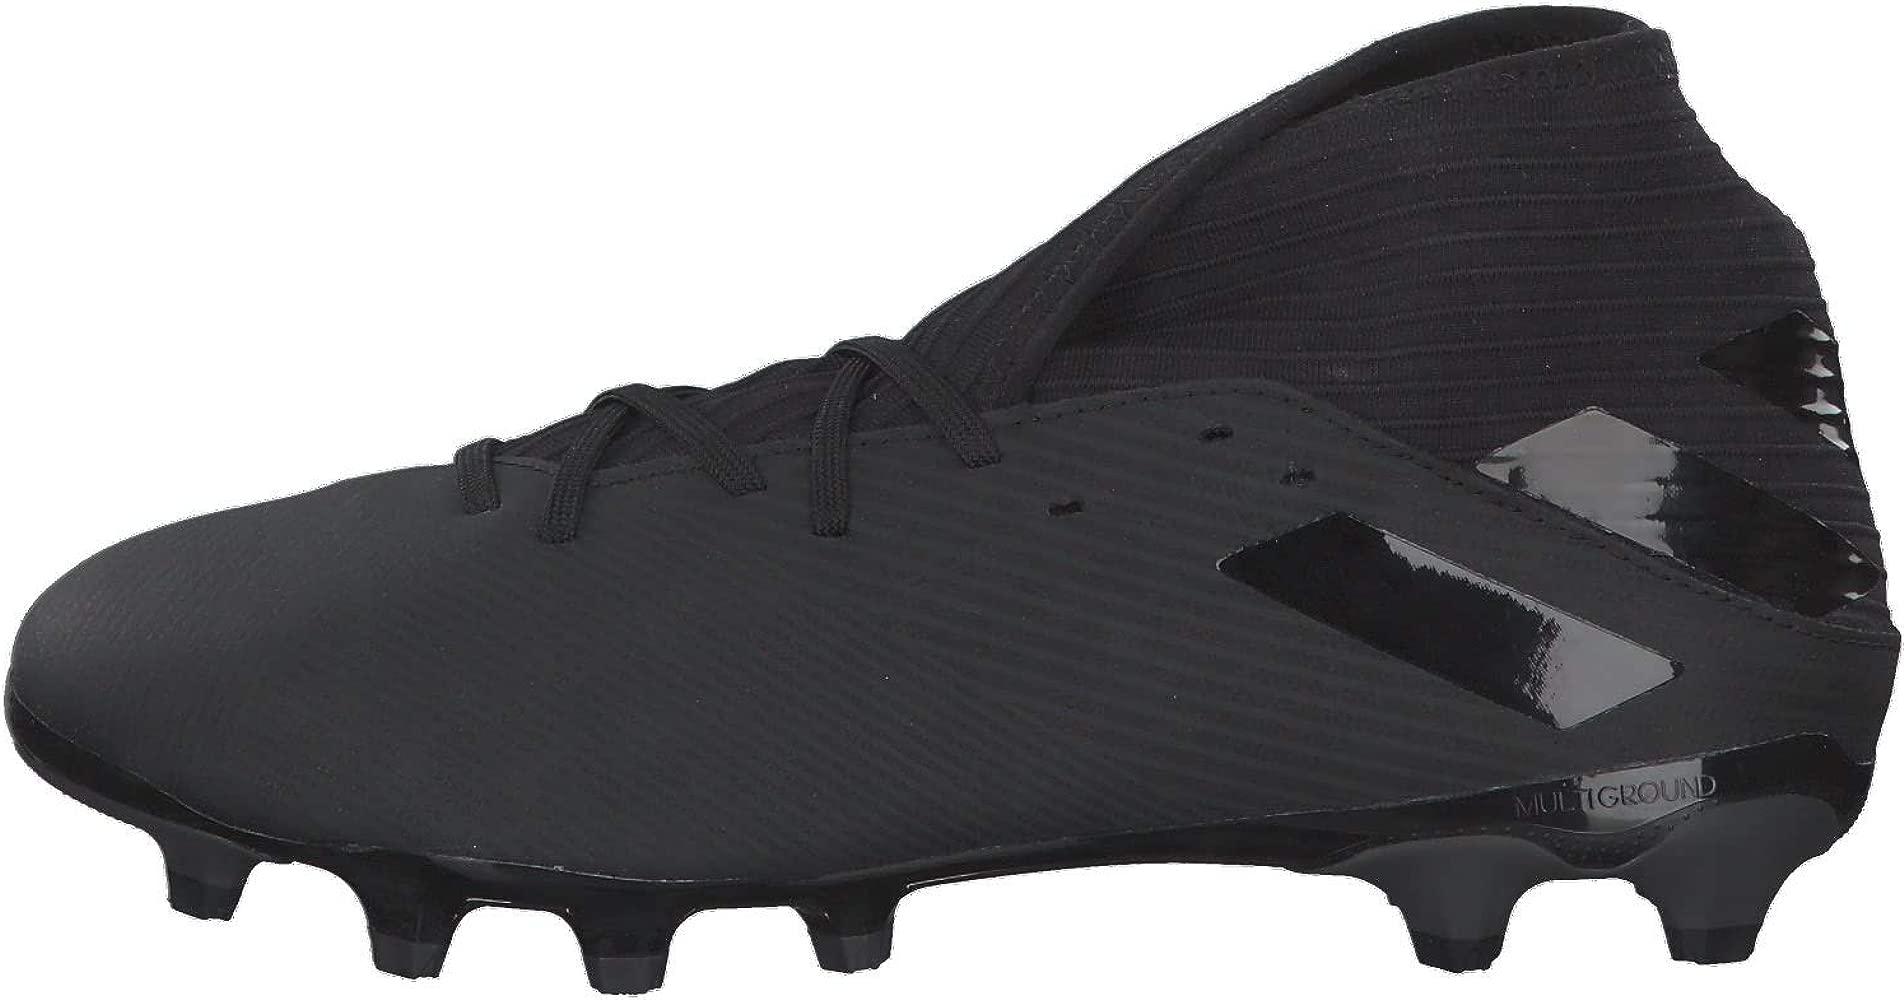 adidas Chaussures Nemeziz 19.3 MG: Amazon.es: Deportes y aire libre